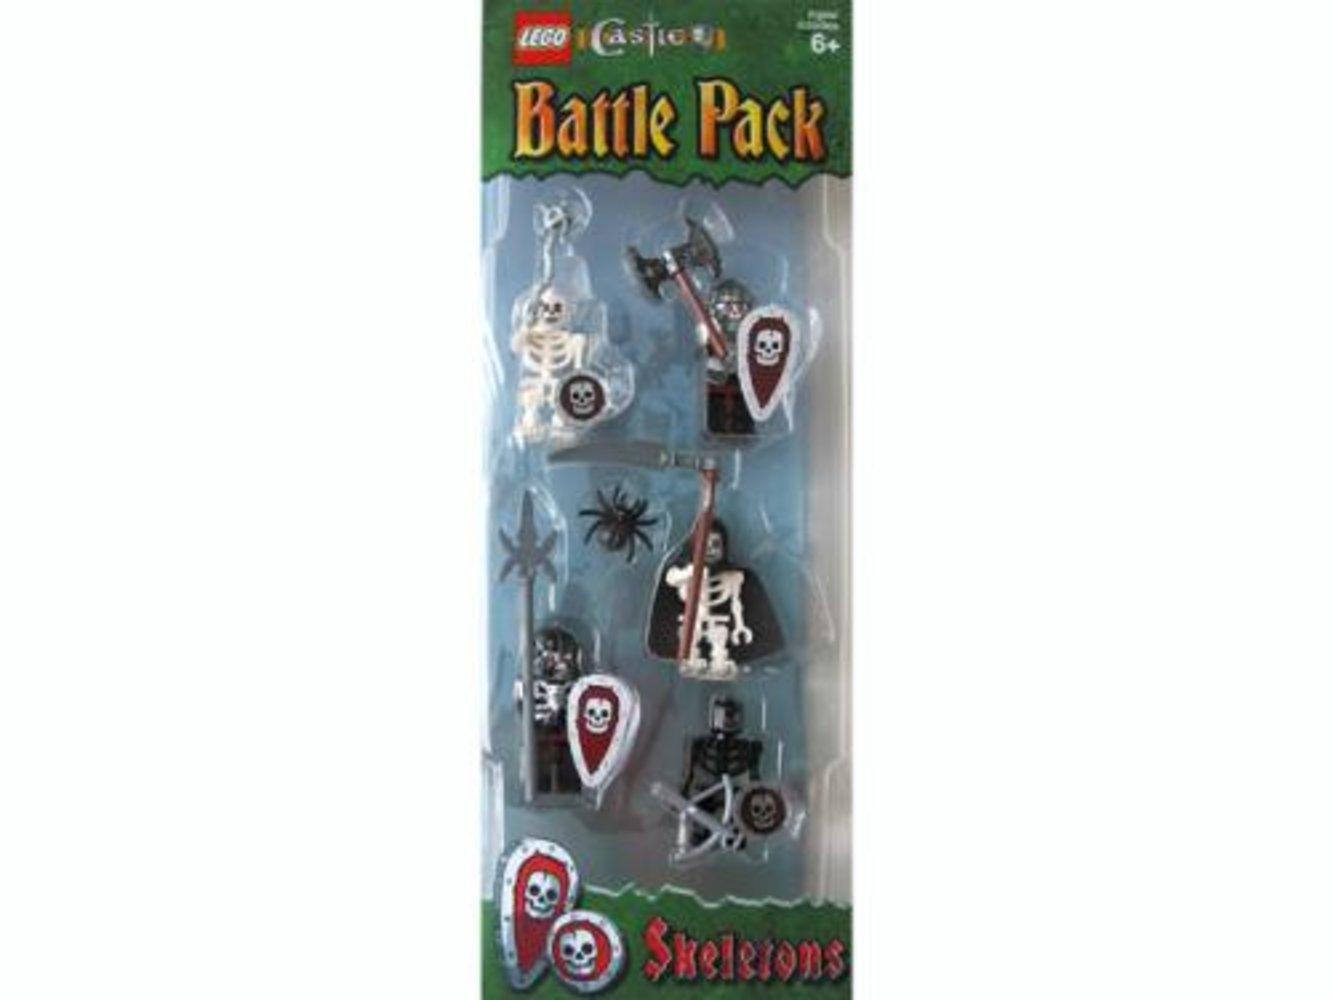 Battle Pack Skeletons